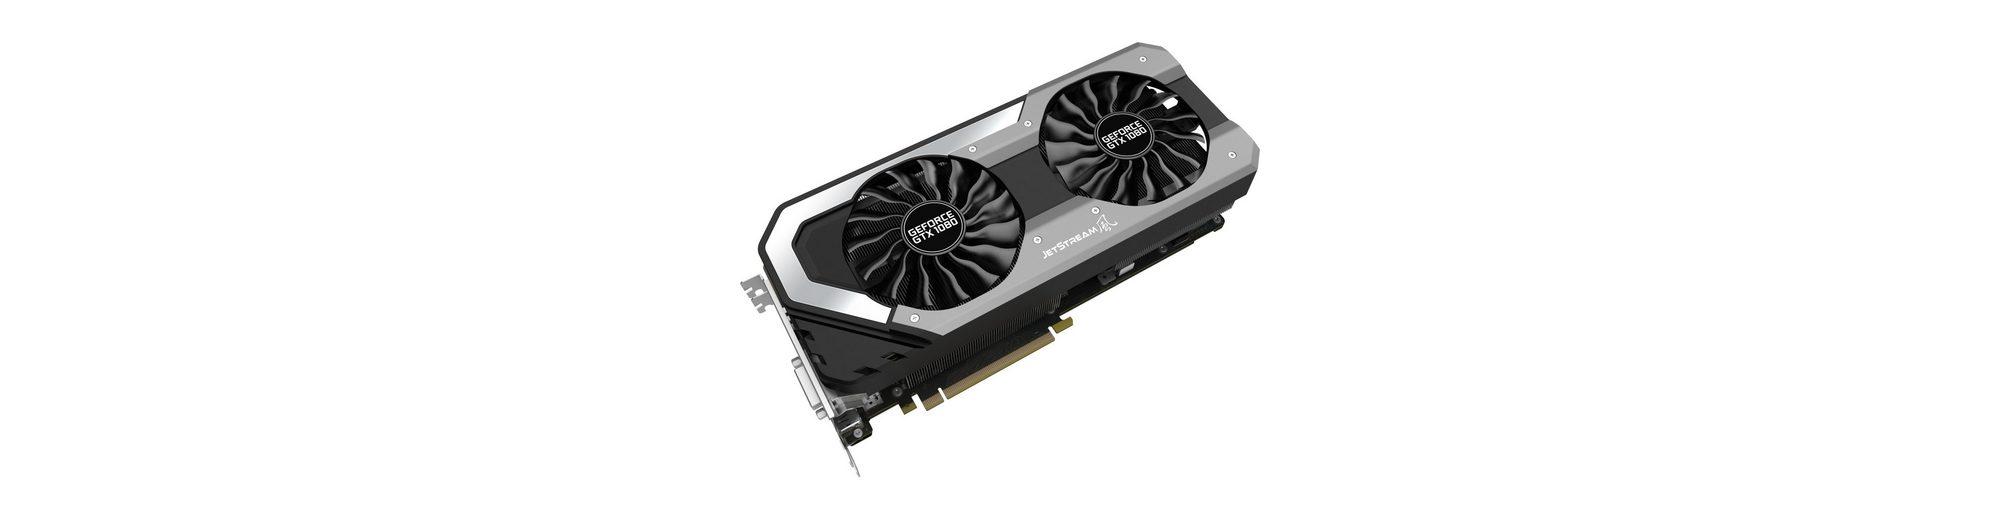 Palit Grafikkarte »GeForce GTX 1080 Jetstream«